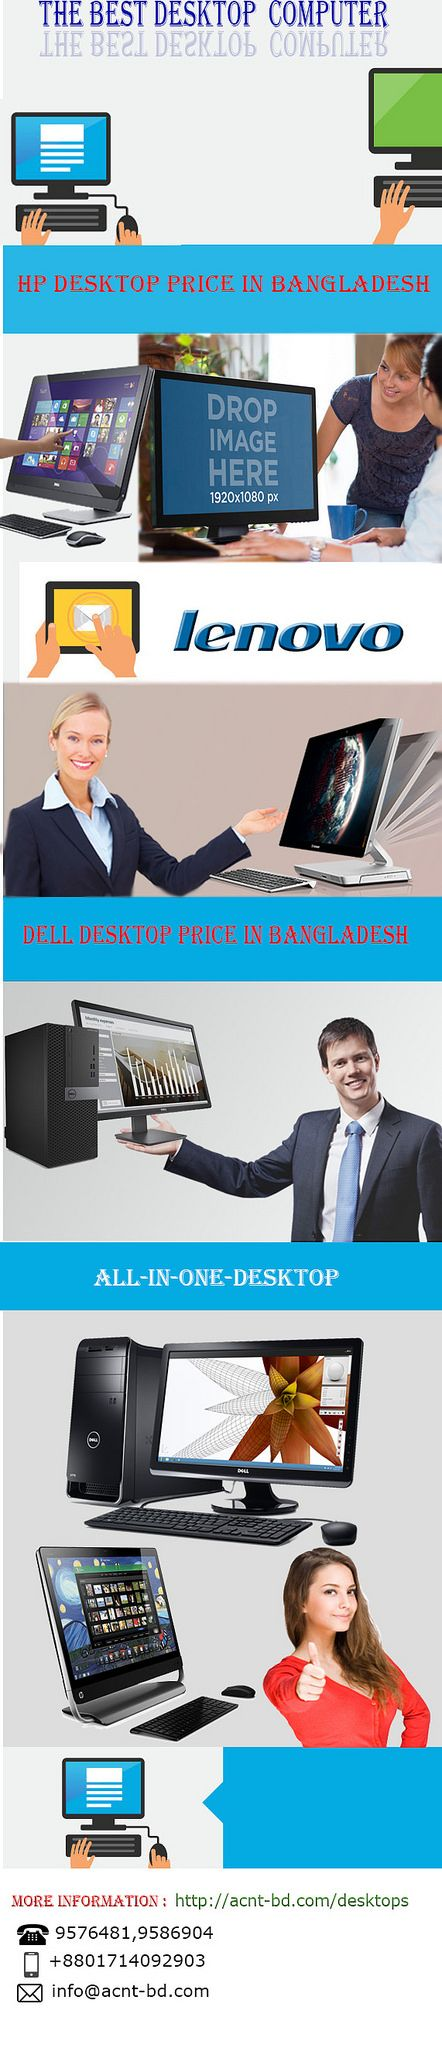 https://flic.kr/p/SxcU7t | Brand Desktop PC in Bangladesh | Desktop Computer Price in Bangladesh | Get the best Brand desktop pc in Bangladesh at Acnt bd. Buy your desired desktop computer pc from our showroom and online store.